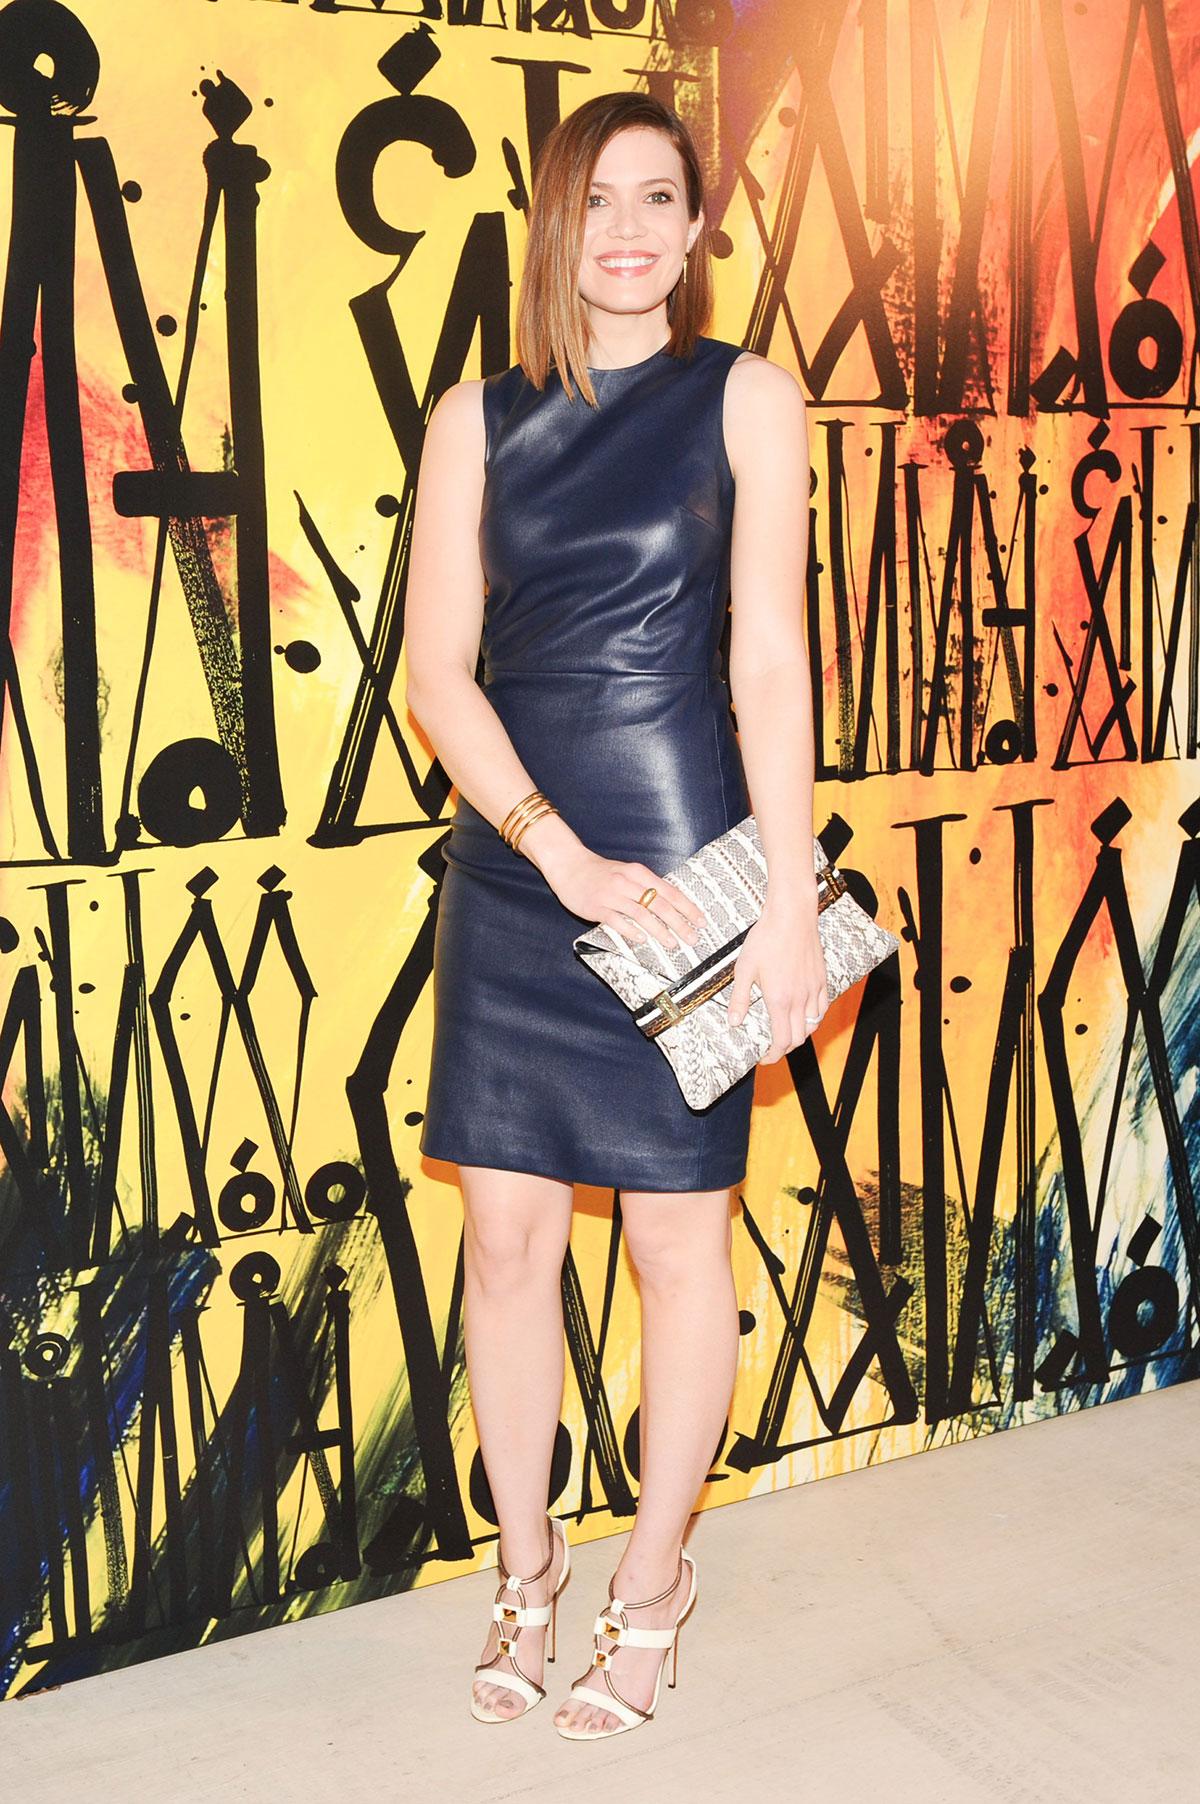 Mandy Moore attends Jiimmy Choo's Sandra Choi Choo 08 launch